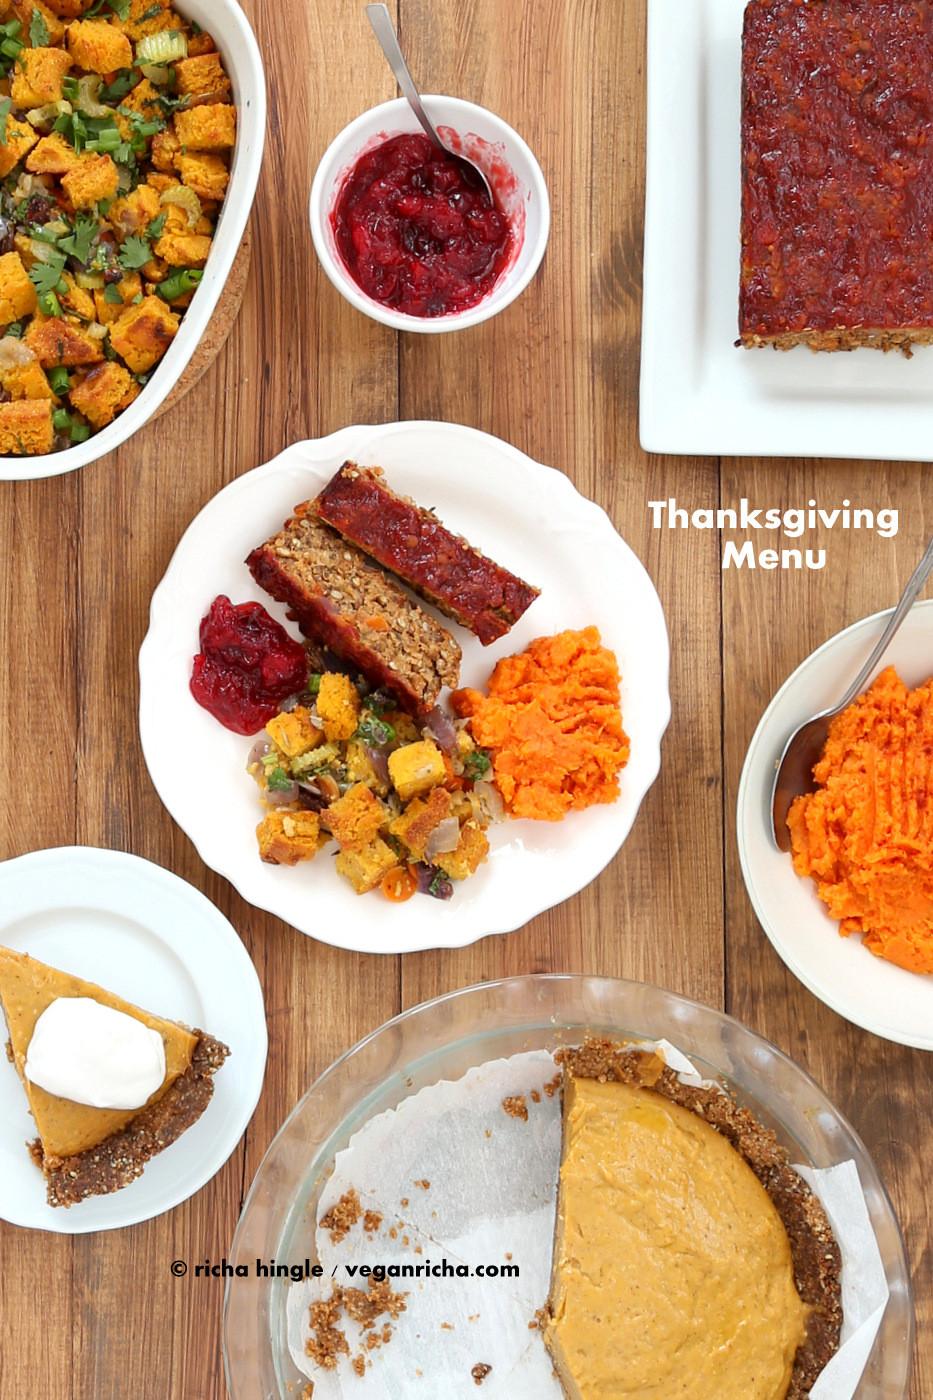 Vegan Turkey Thanksgiving  80 Vegan Thanksgiving Recipes 2014 Vegan Richa